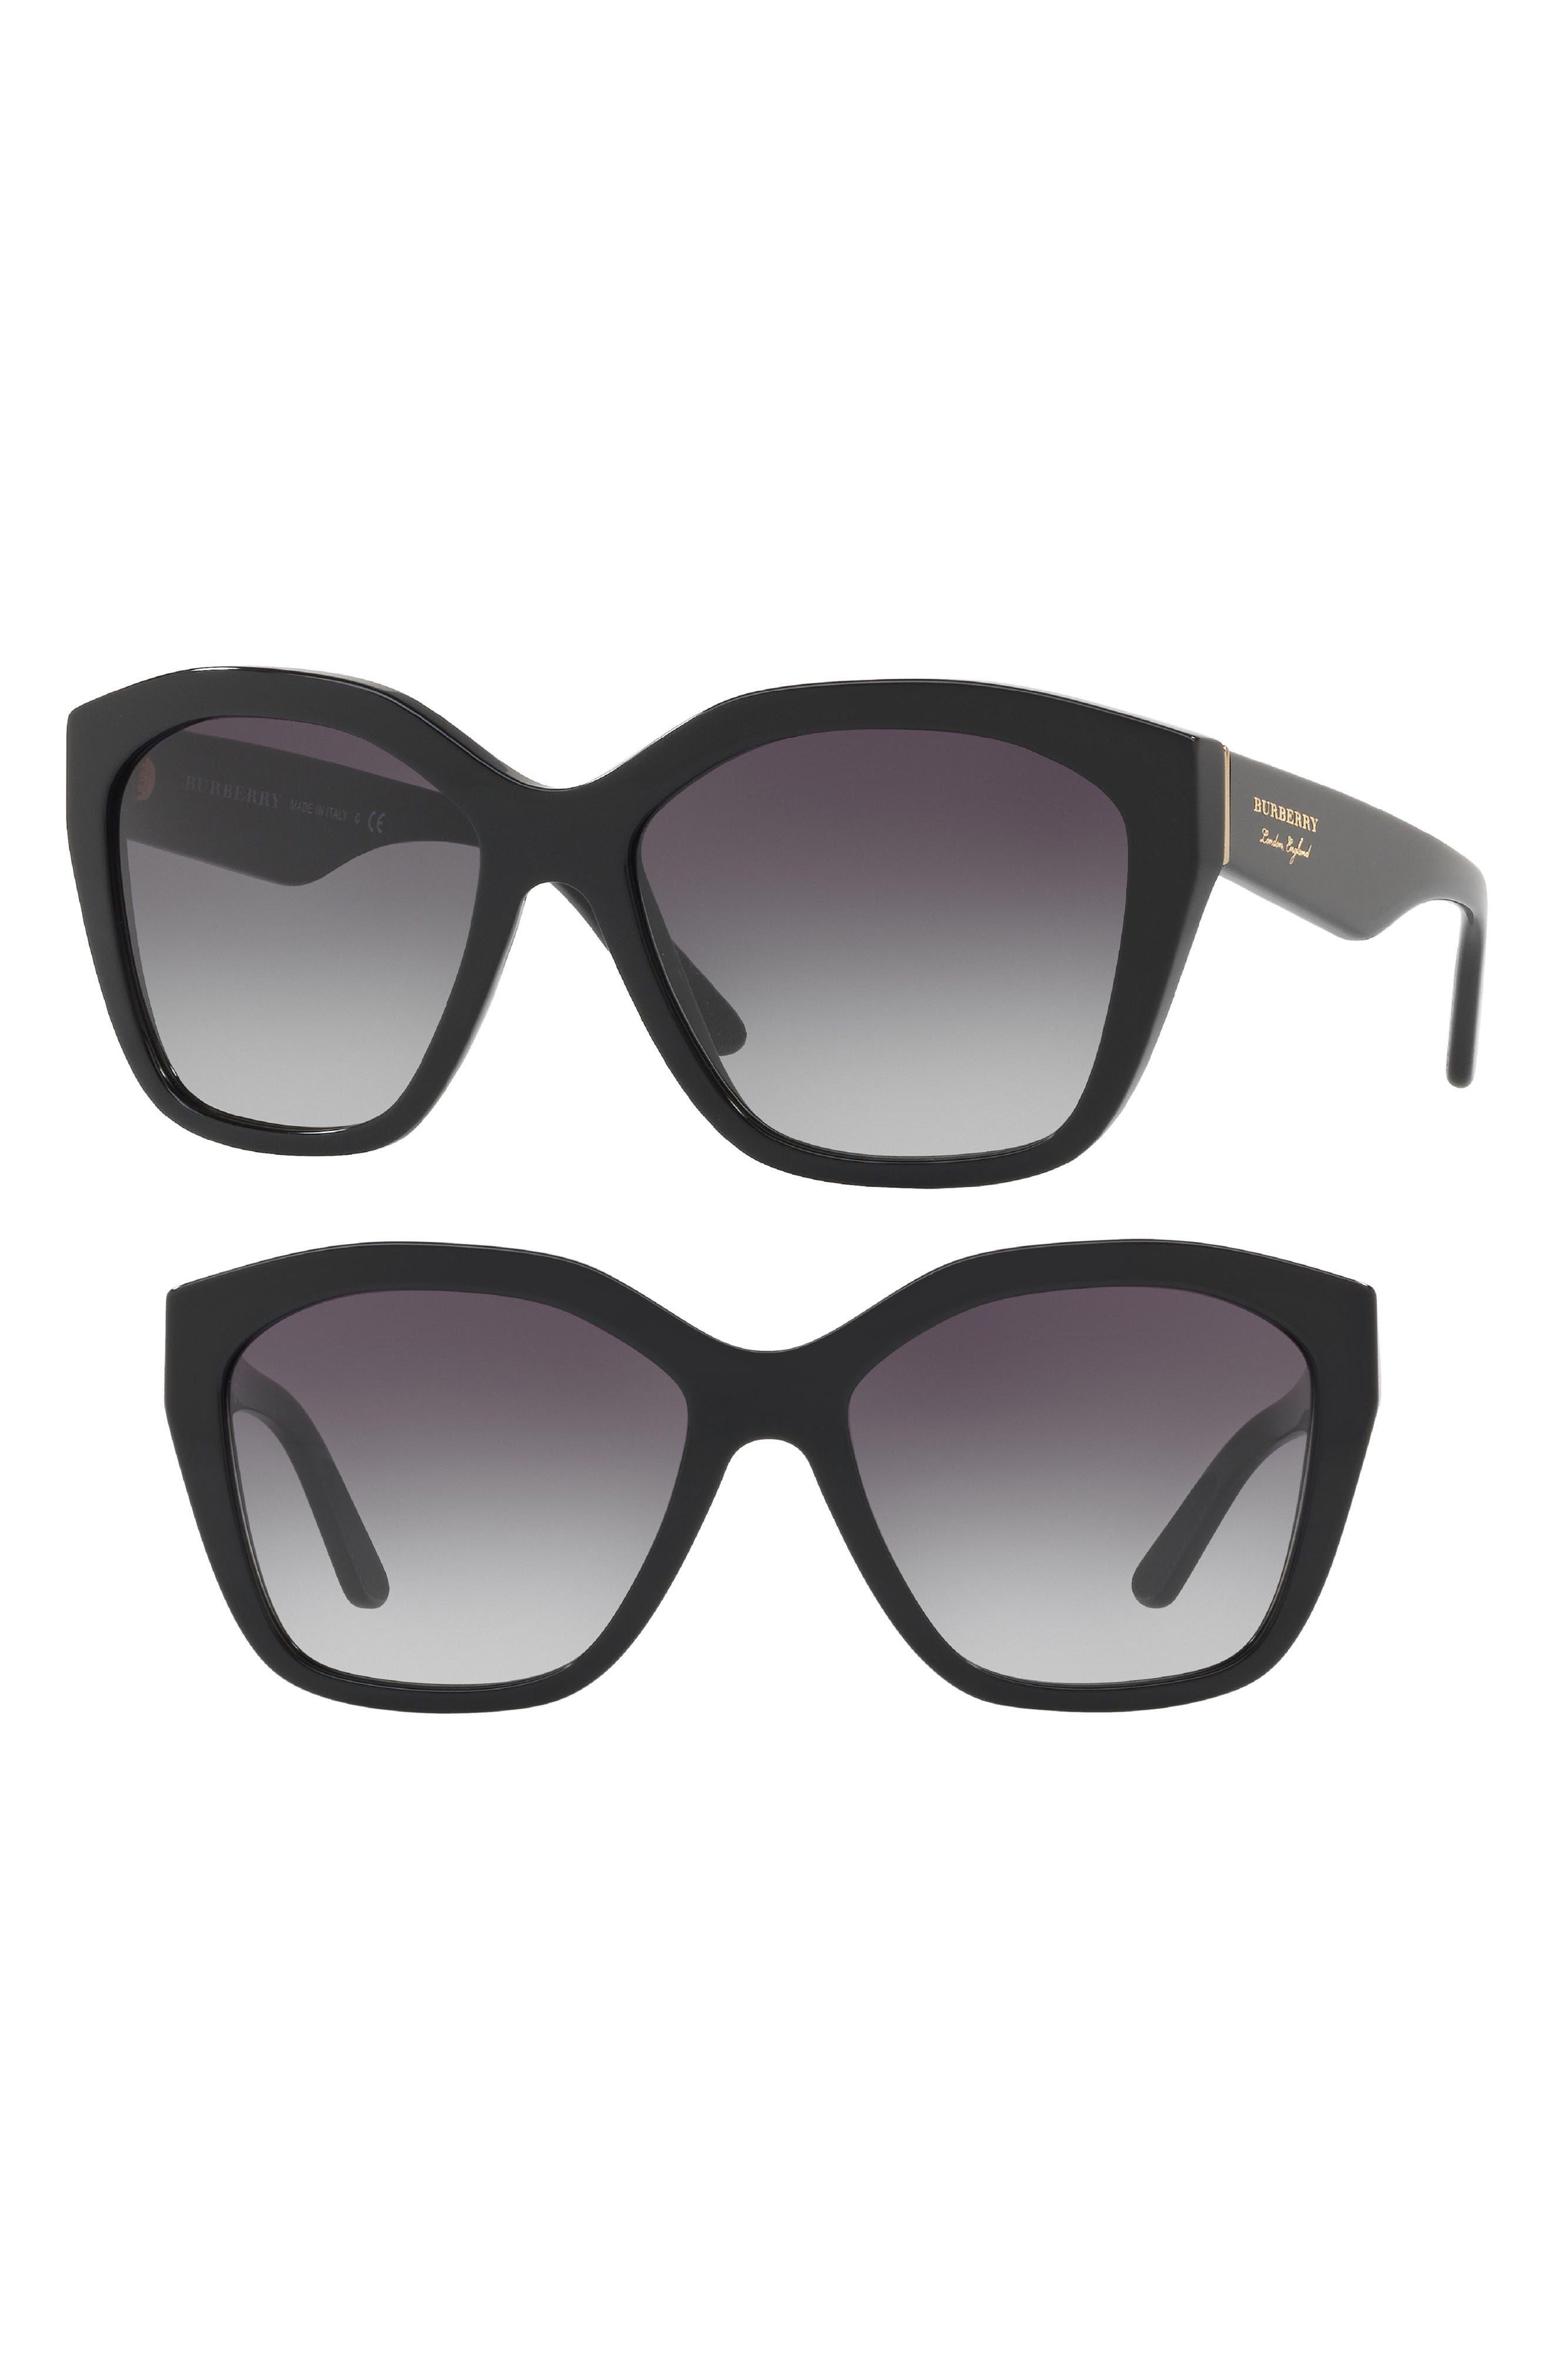 Burberry 57mm Gradient Sunglasses